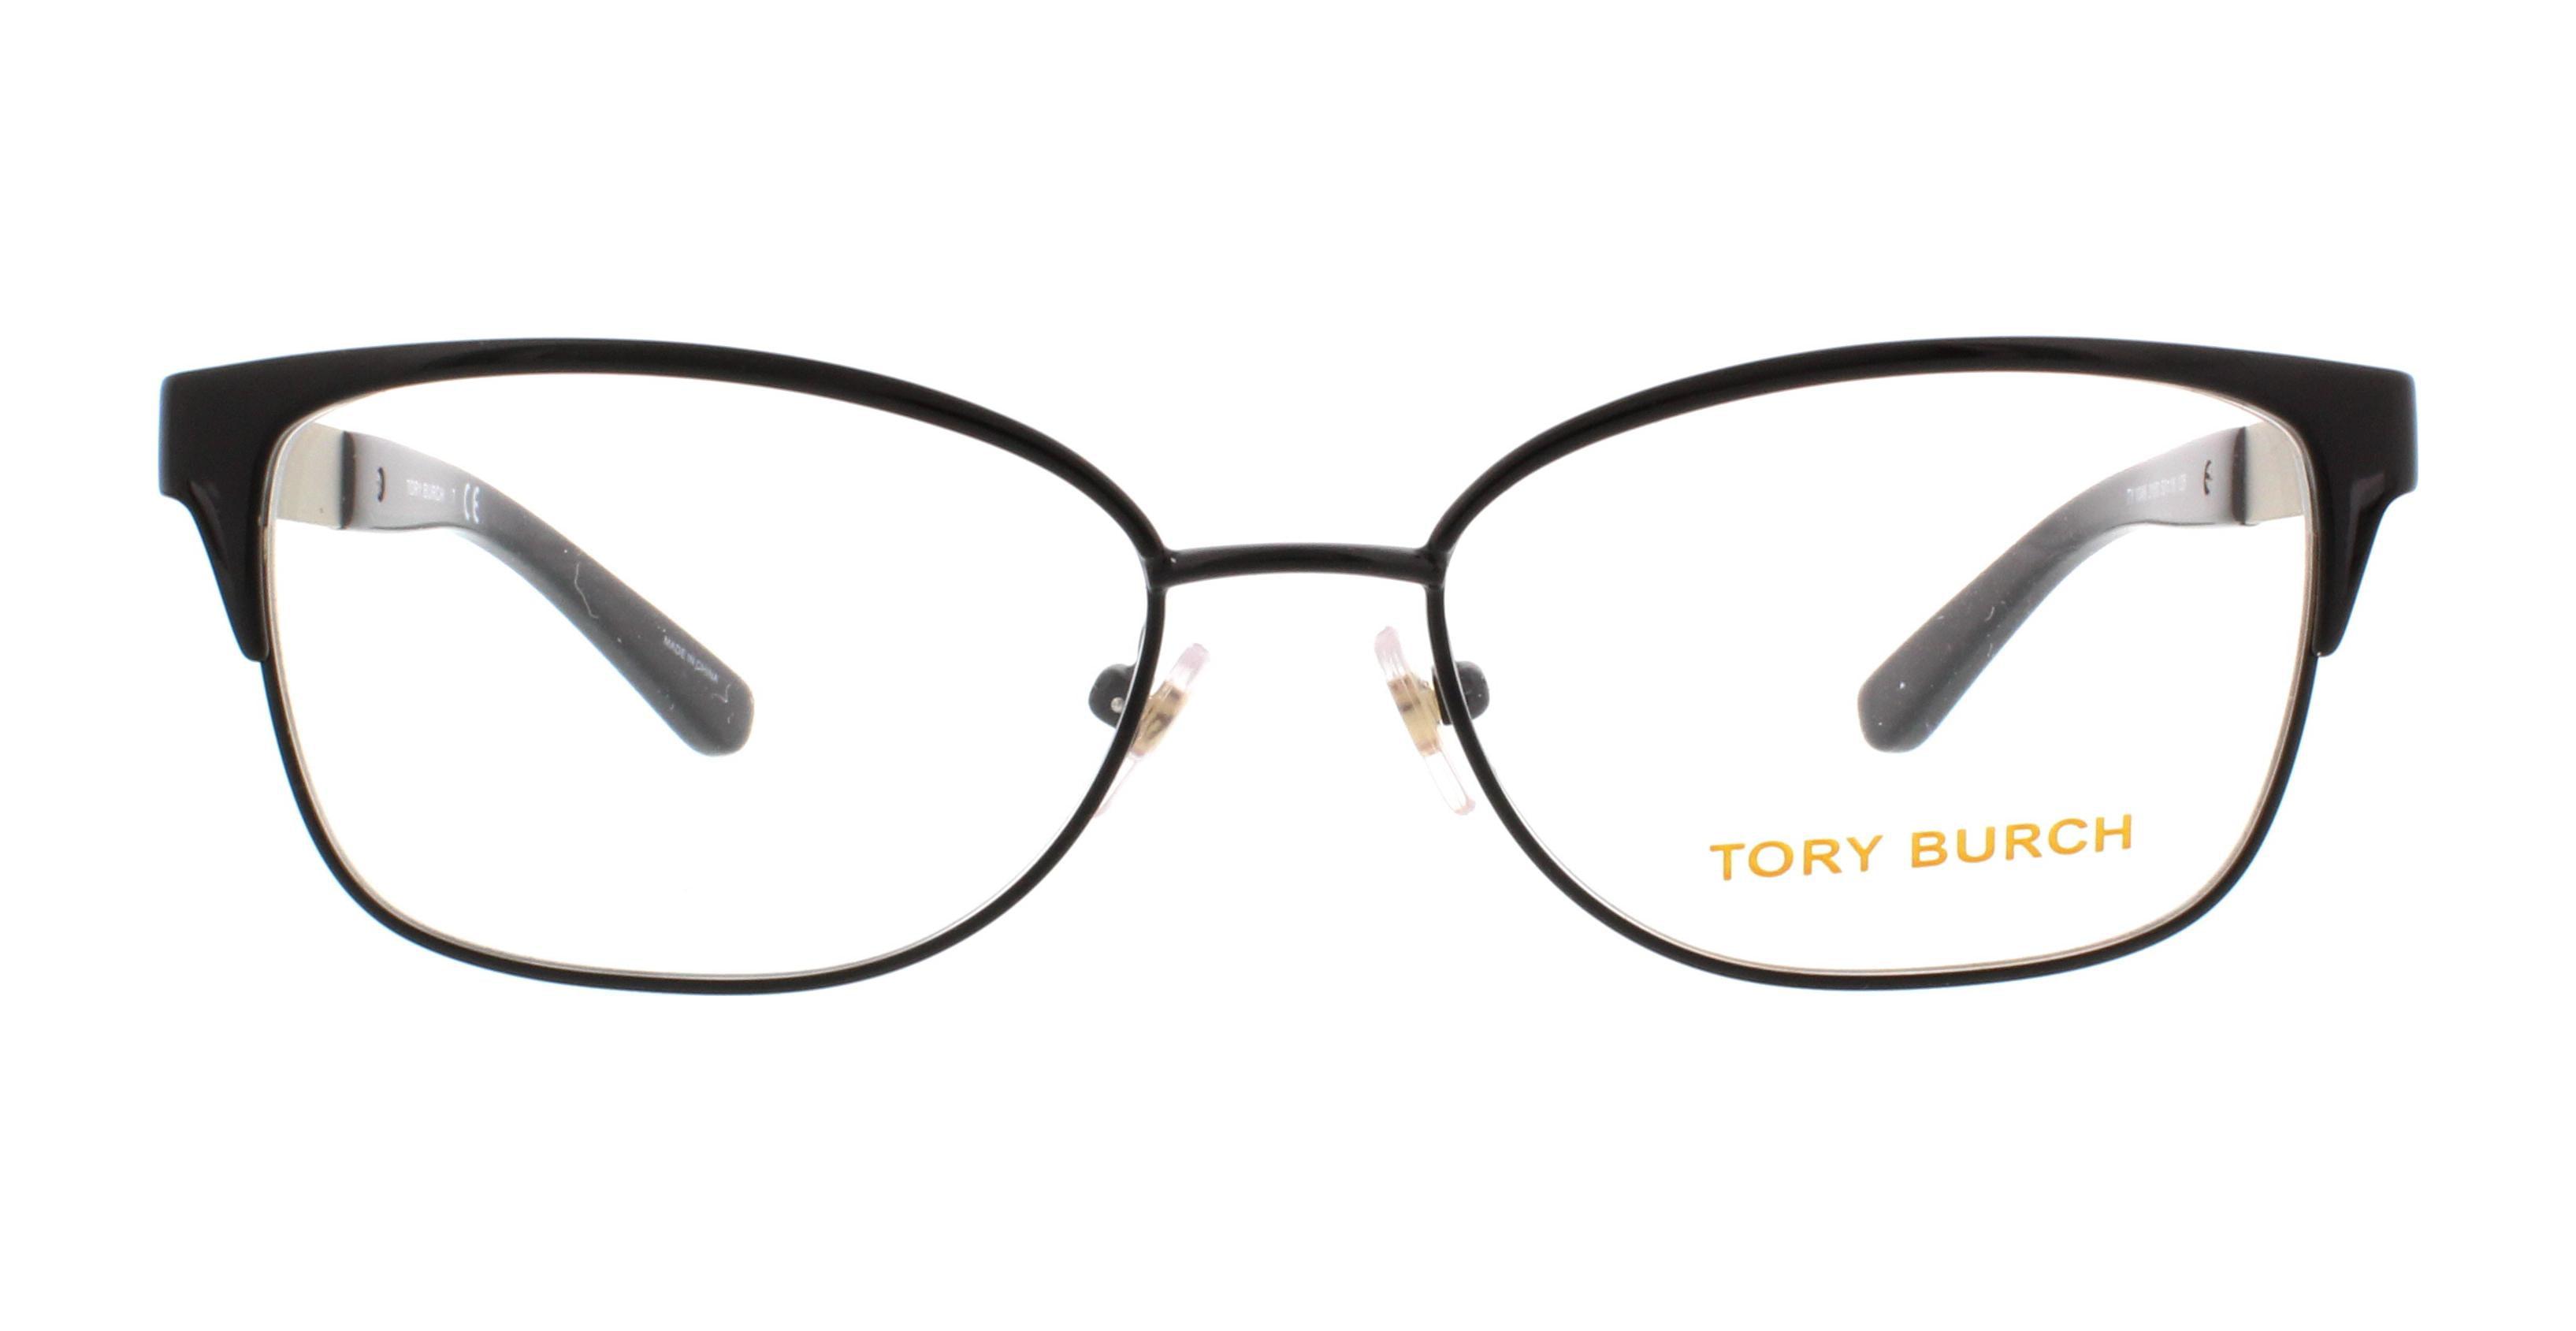 9f8e23df24c0 TORY BURCH Eyeglasses TY1046 3100 Black/Gold 52MM - Walmart.com